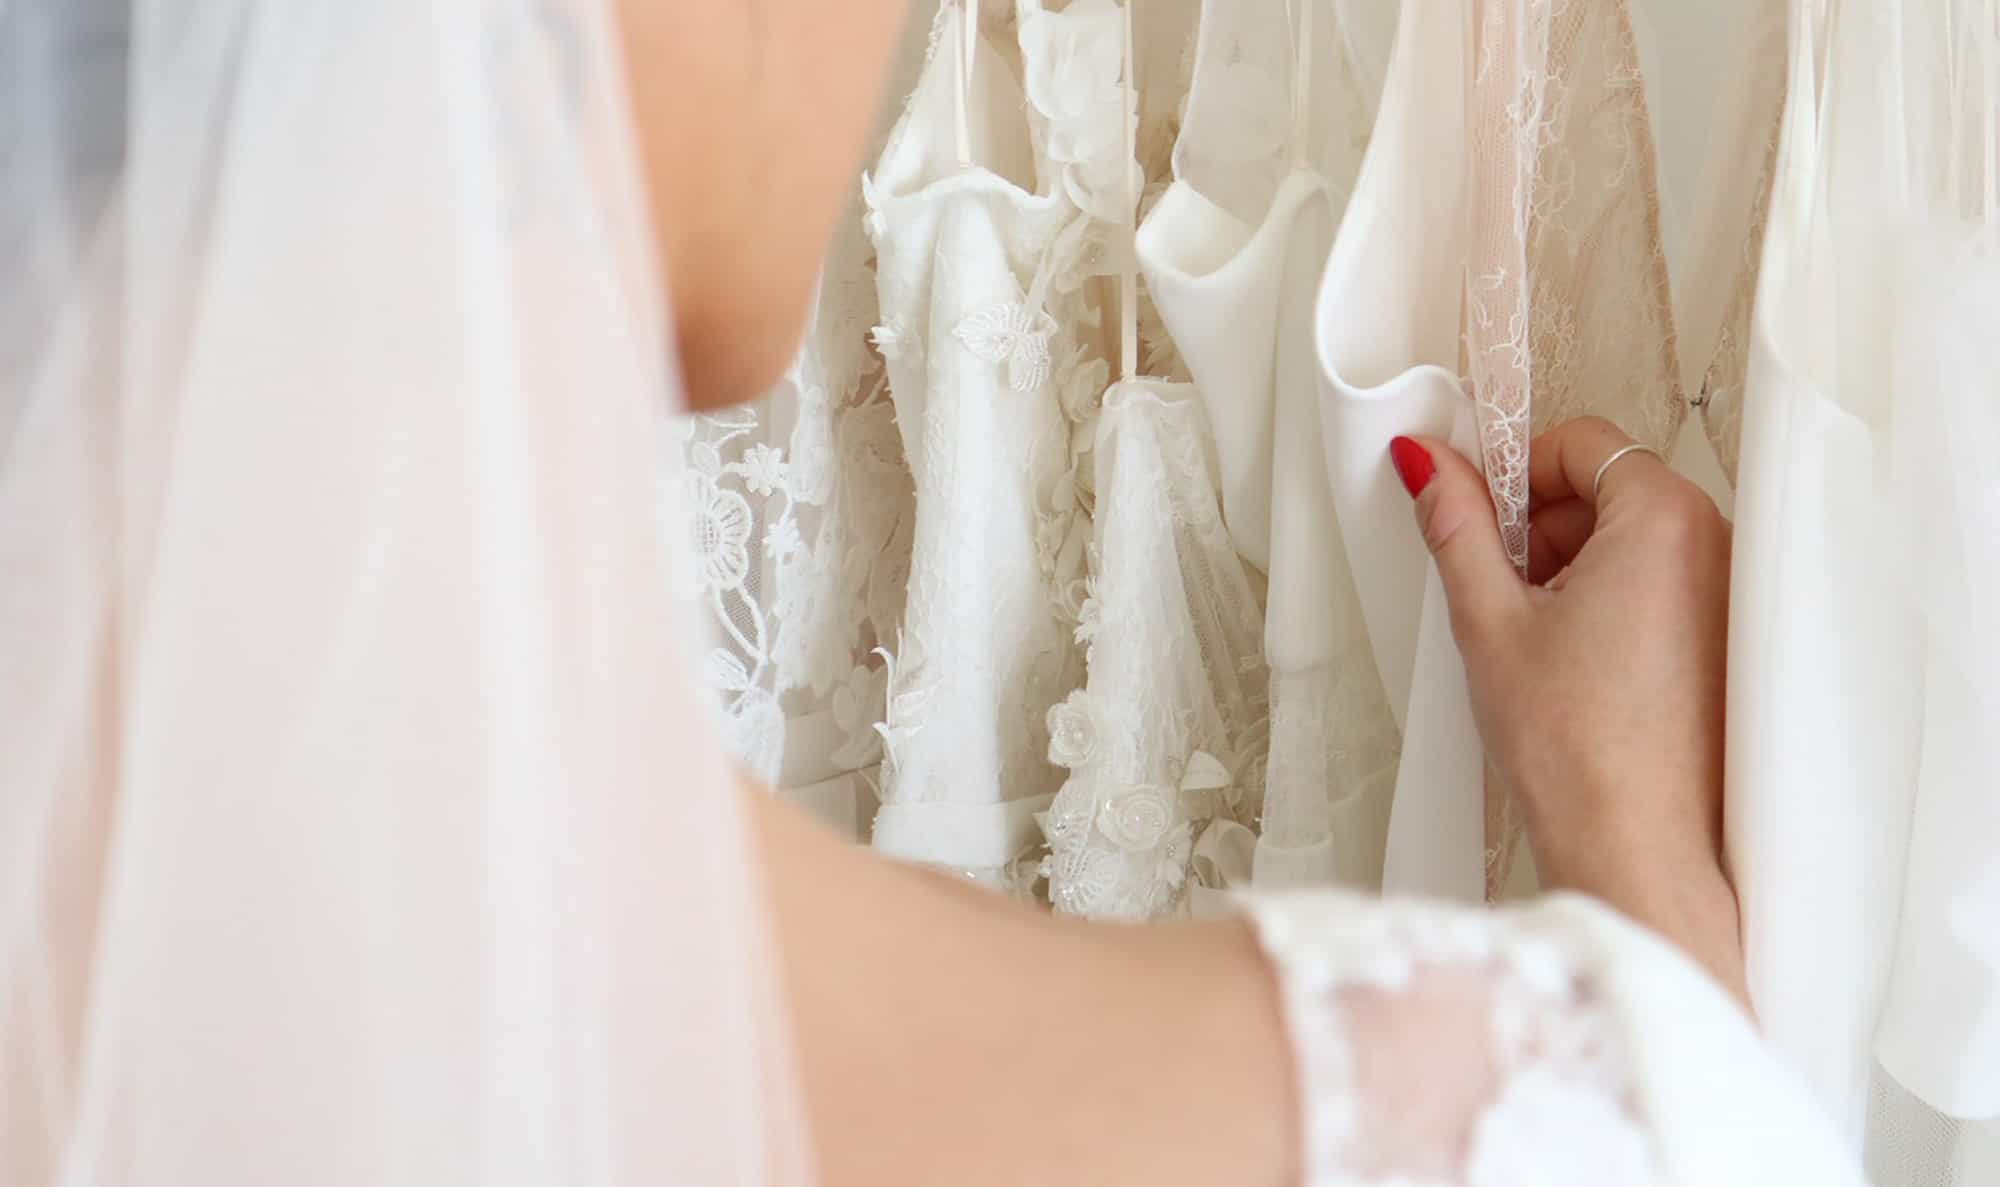 Création de robe de mariée à Marseille | Essayage